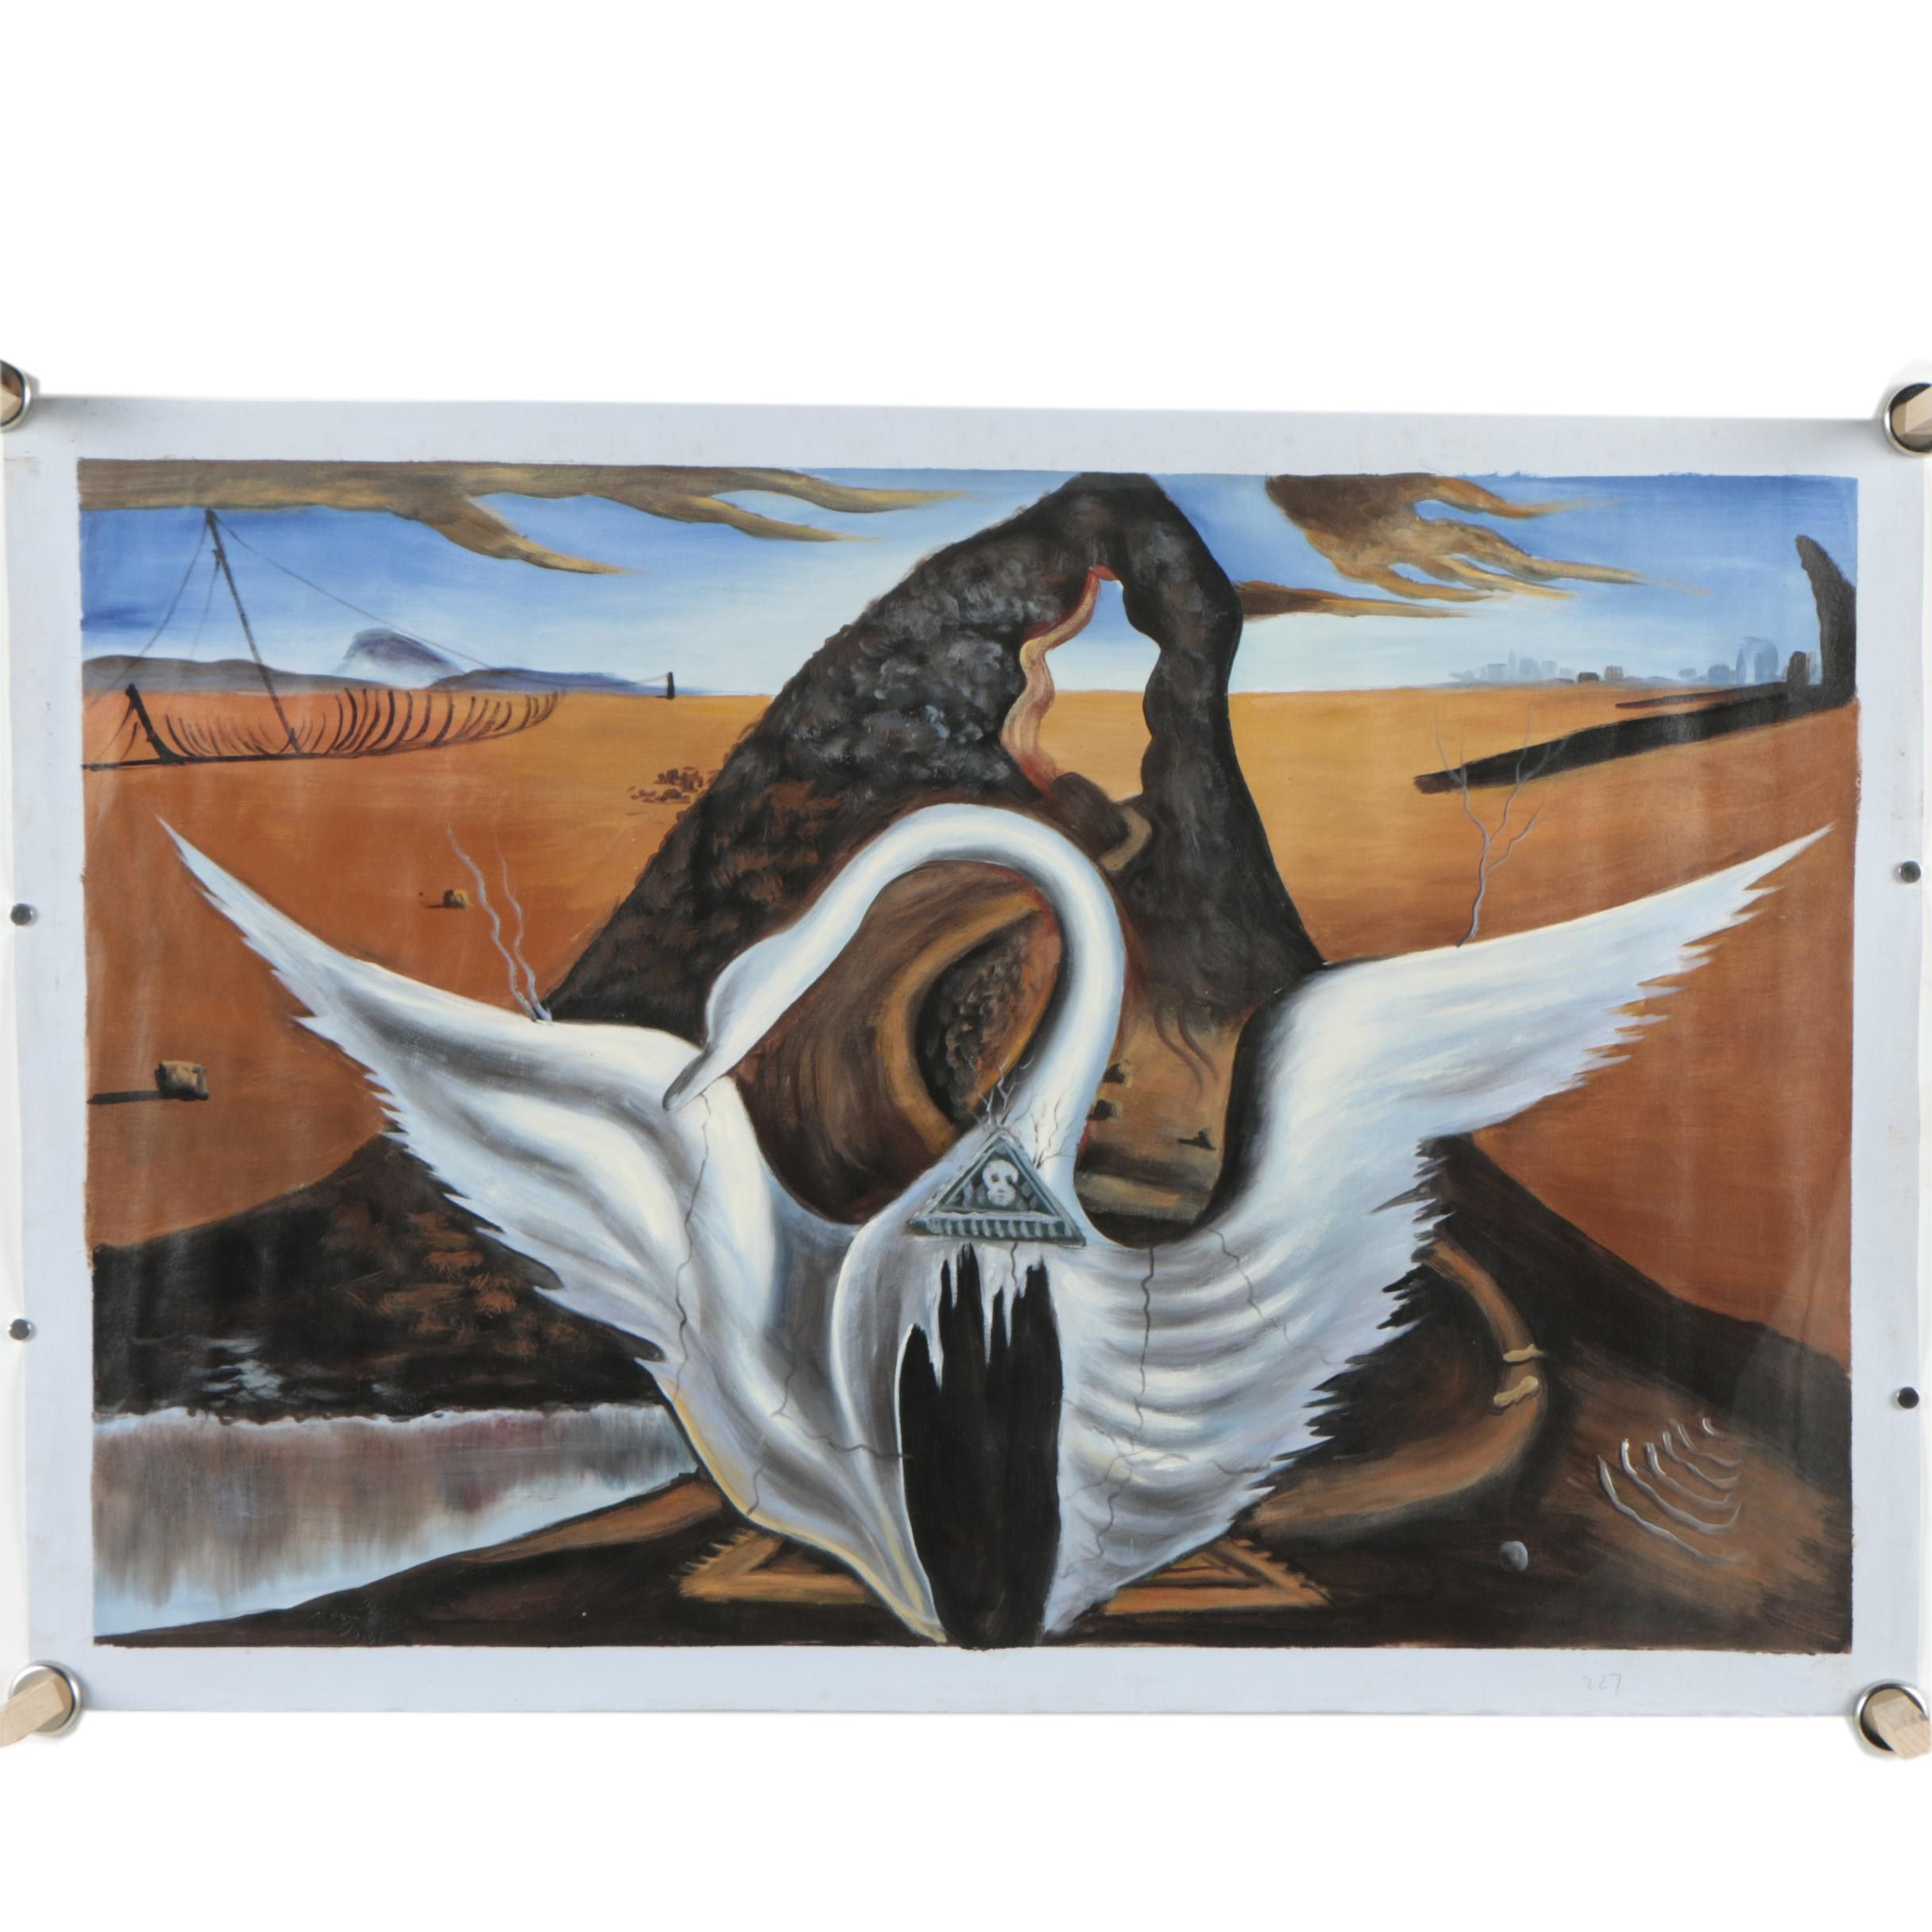 "Copy Oil Painting After Salvador Dalí's ""Set for 'Bacchanale'"""